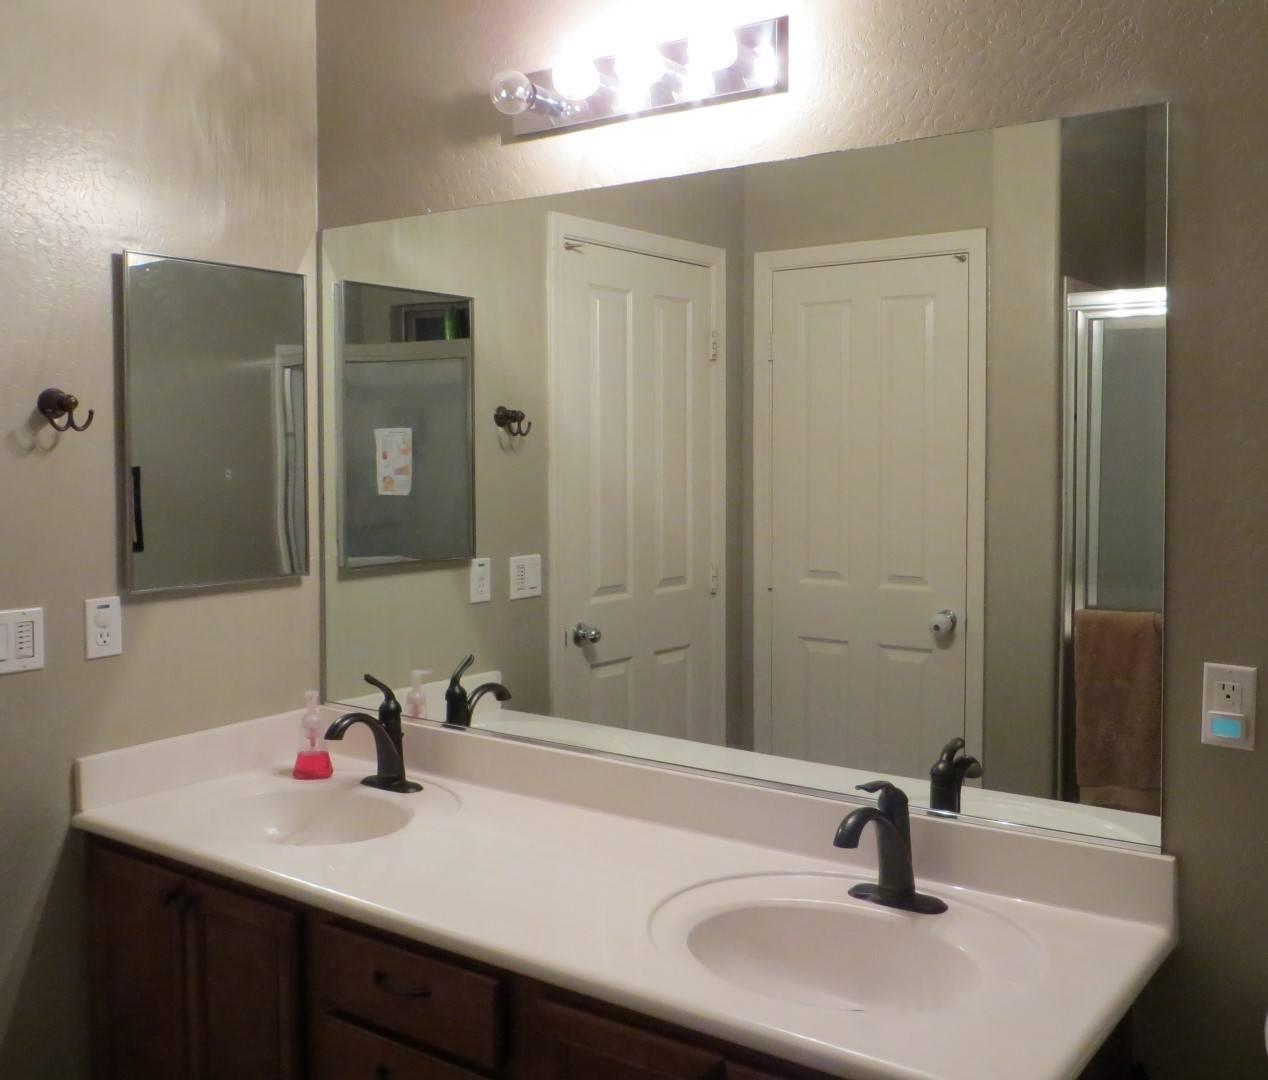 Frameless Bathroom Mirrors Ideas 2017 And Large Mirror Pictures with Frameless Large Mirrors (Image 9 of 25)